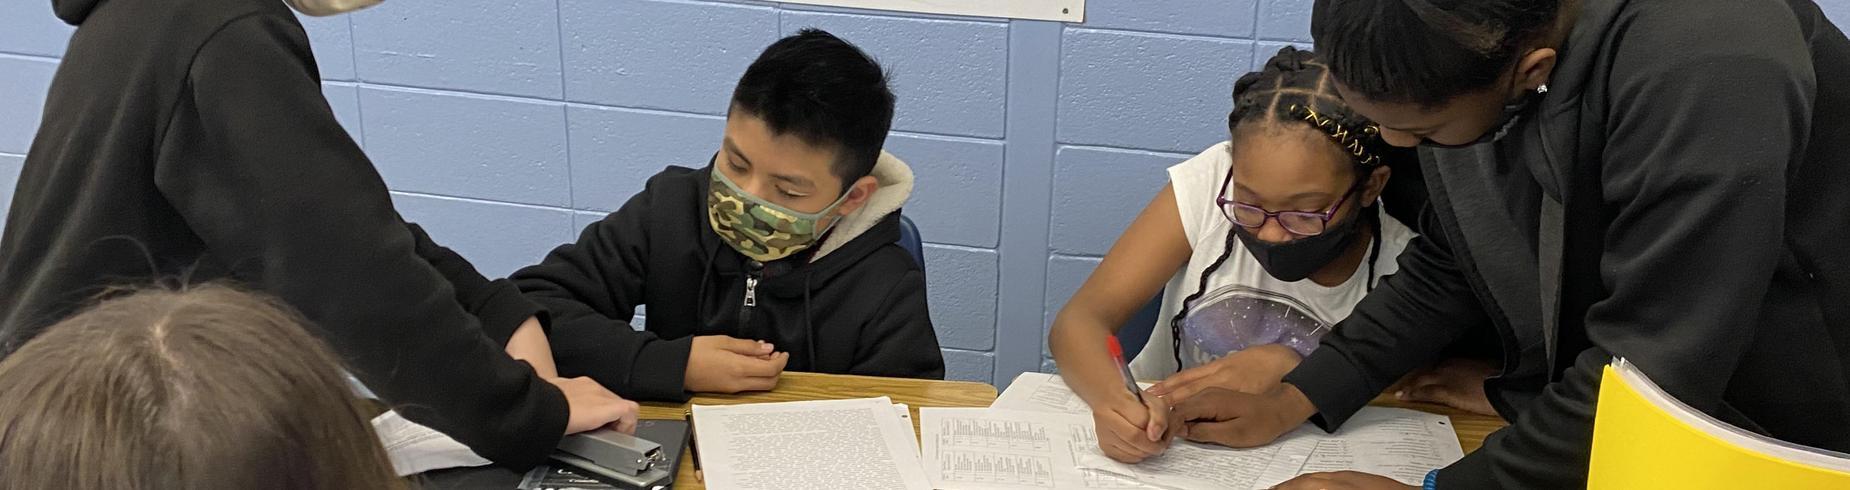 students peer editing